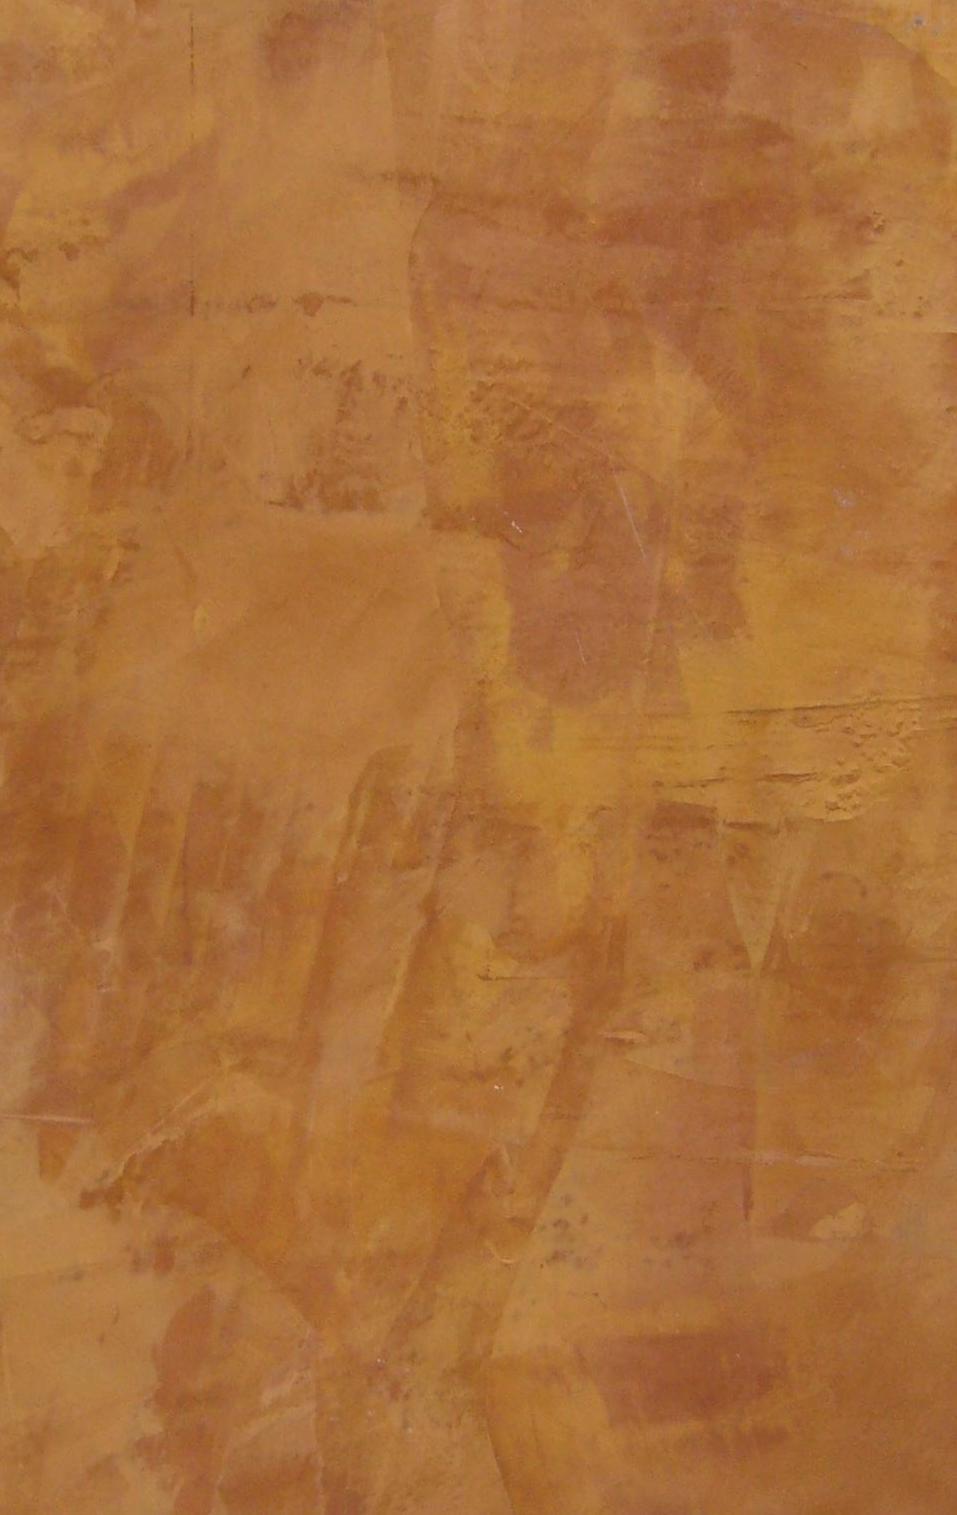 Types Of Plaster Wall Finishes : Italian plaster works textures kansas city